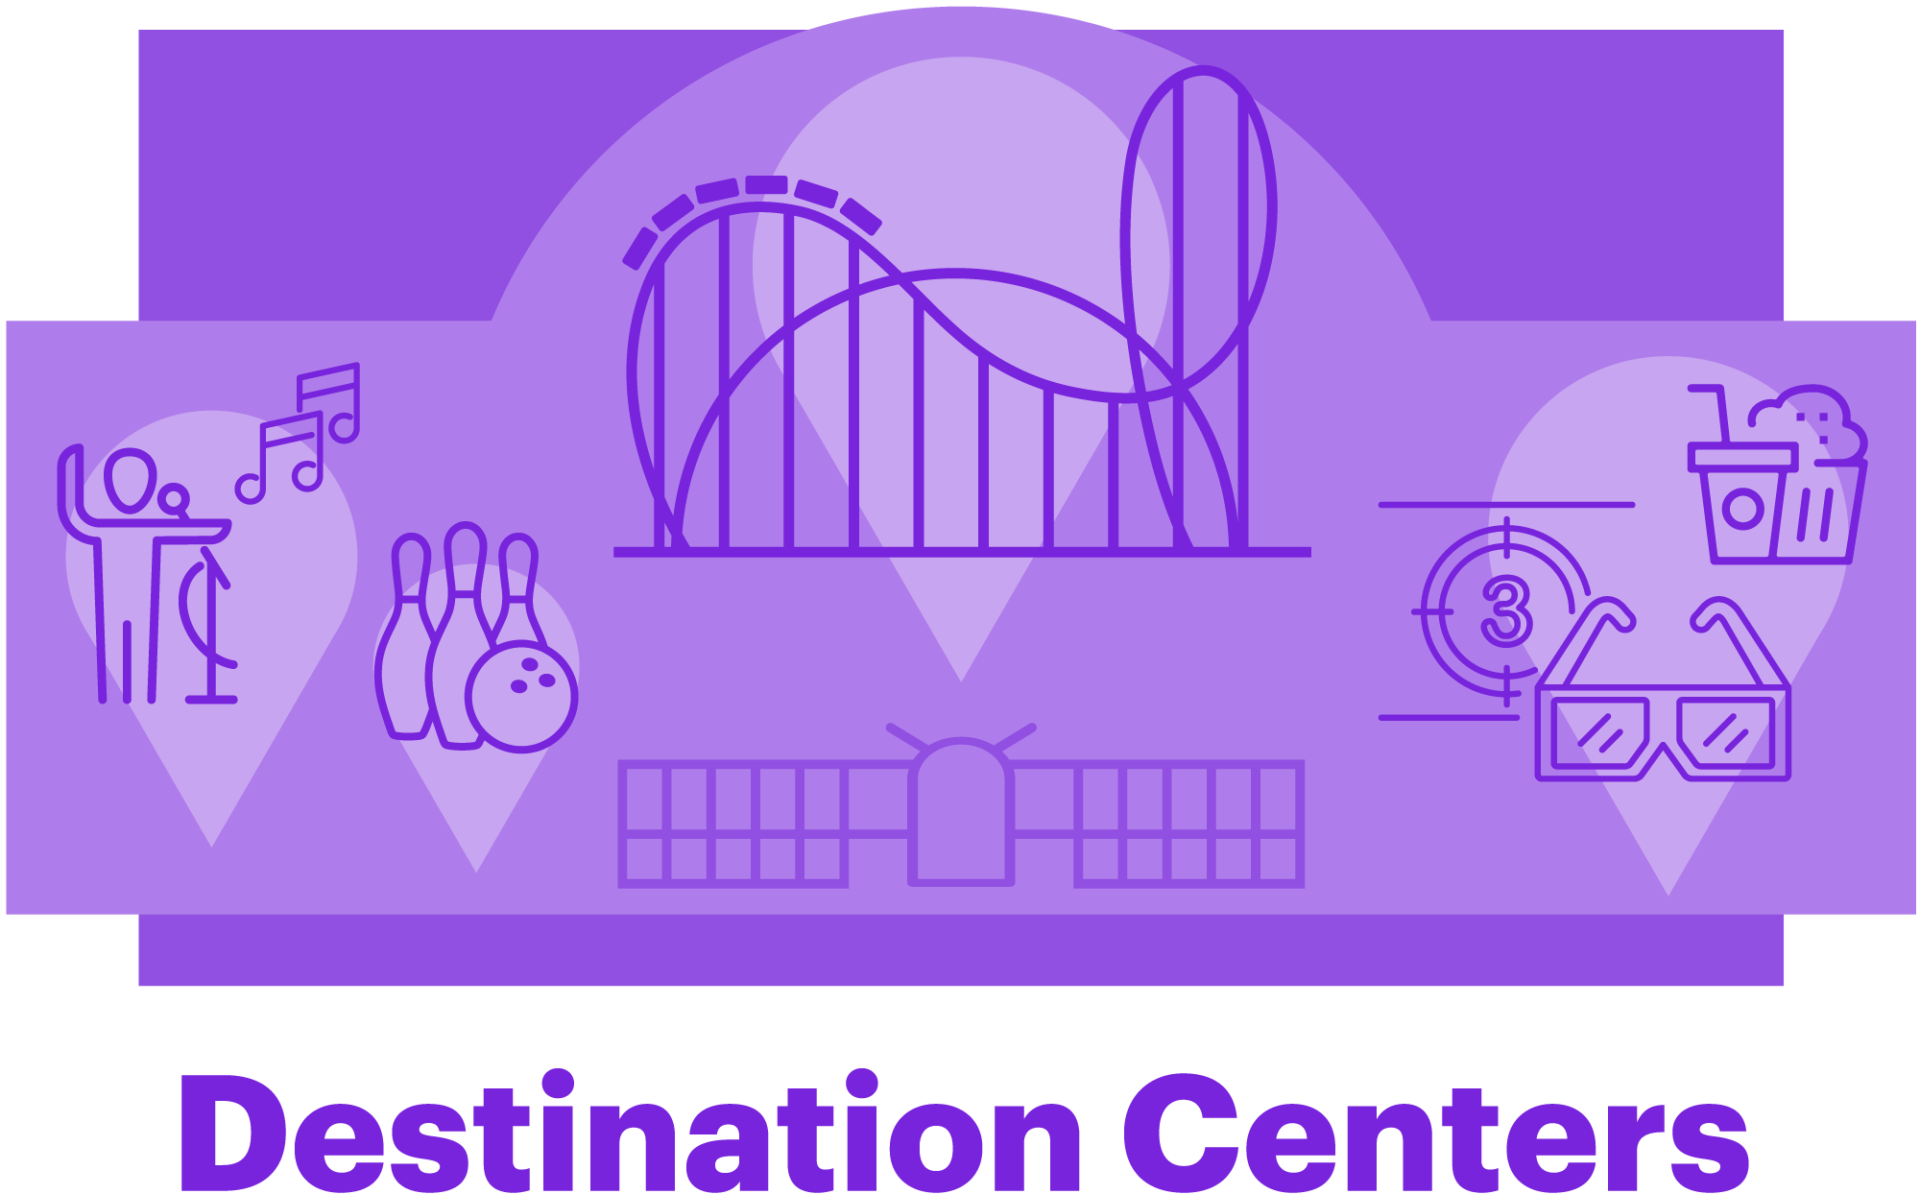 Future-of-Shopping-Centers-1-Destination-Centers